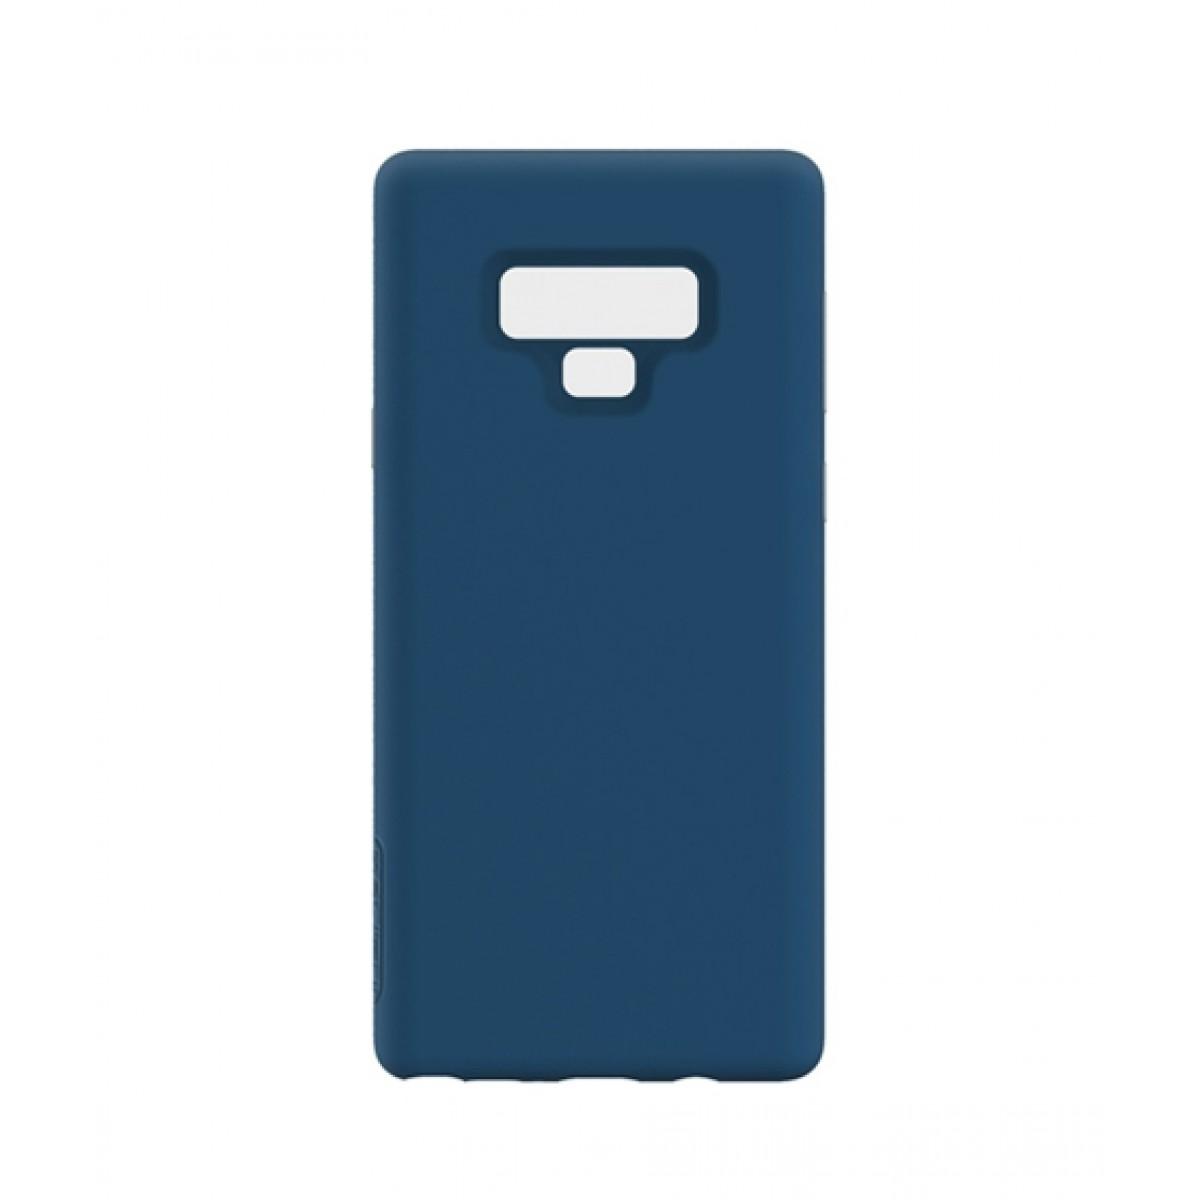 watch 801d9 303f5 Incipio Siliskin Powerd Blue Case For Galaxy Note 9